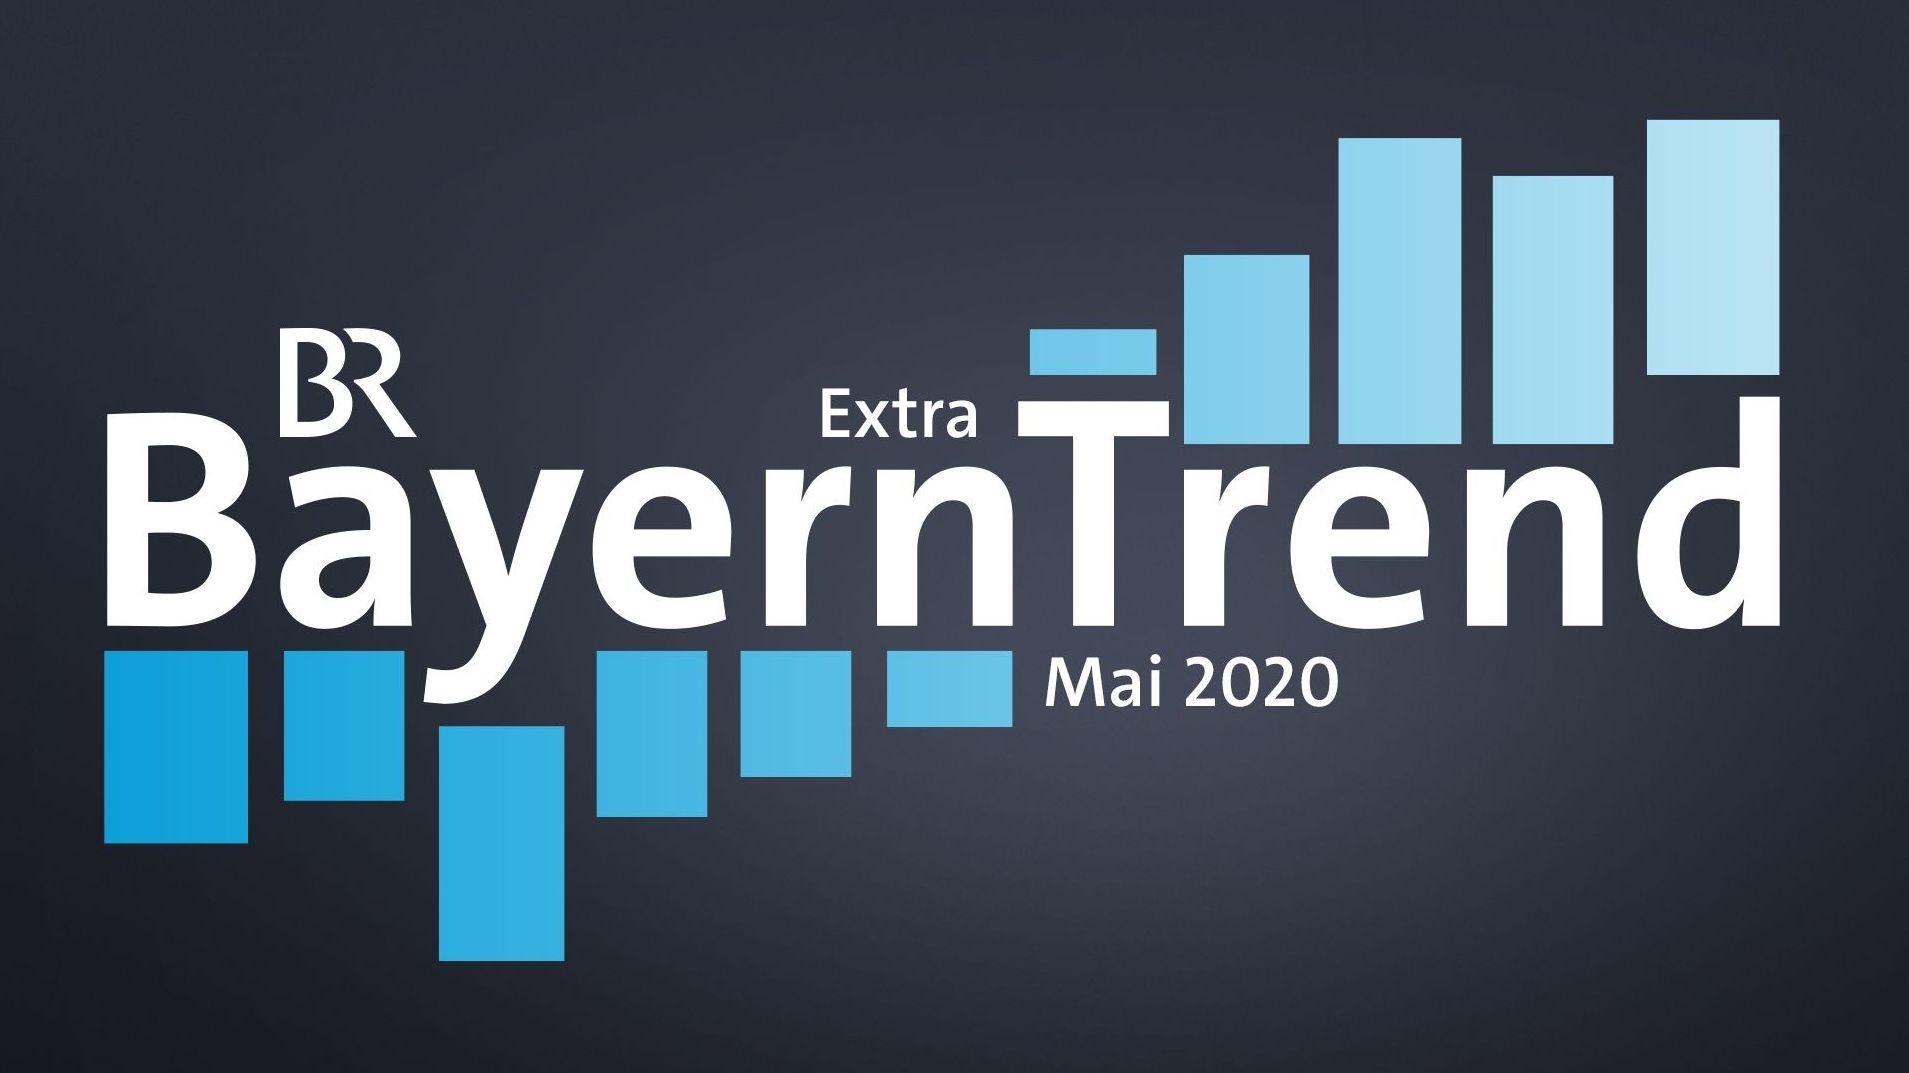 BR-BayernTrend extra im Mai 2020